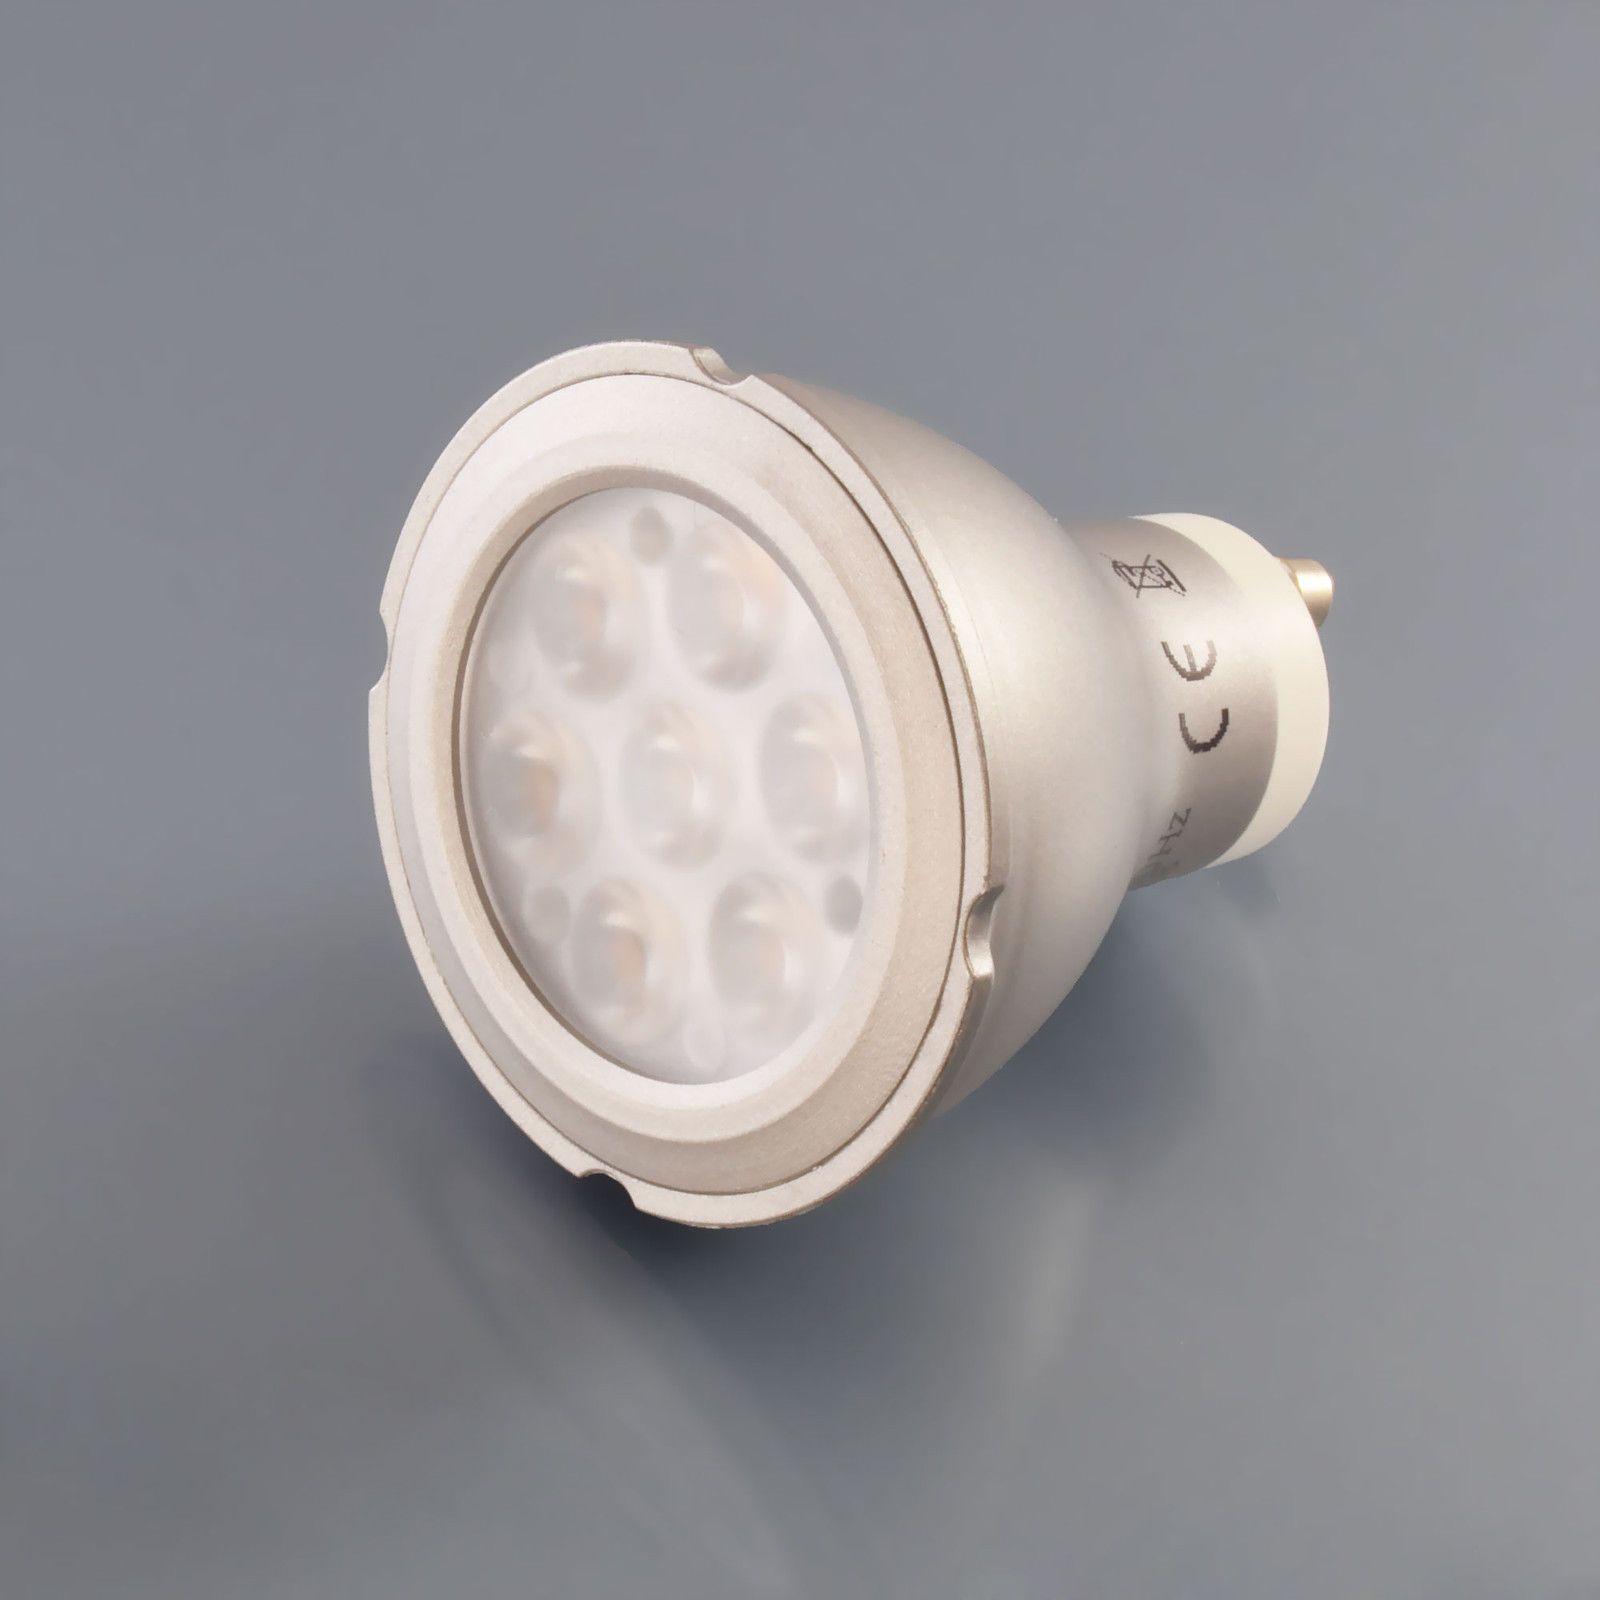 cc300a6d3804a3817a2e07c3088018b7 Stilvolle Led Leuchtmittel G4 Dekorationen